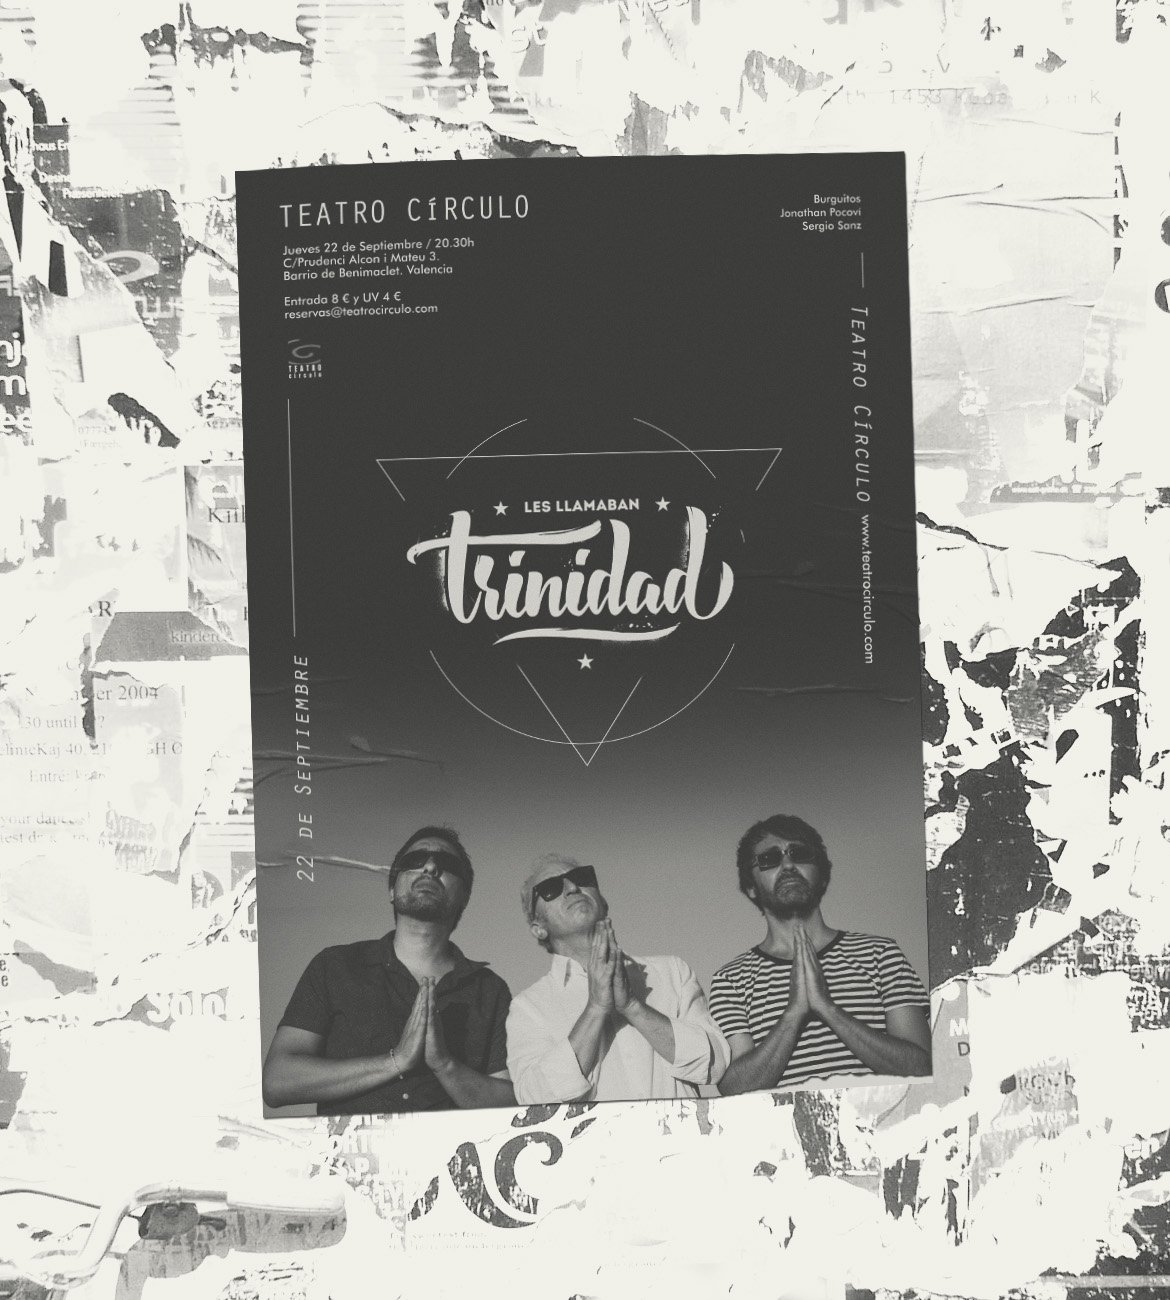 Cartel para Les llamaban trinidad